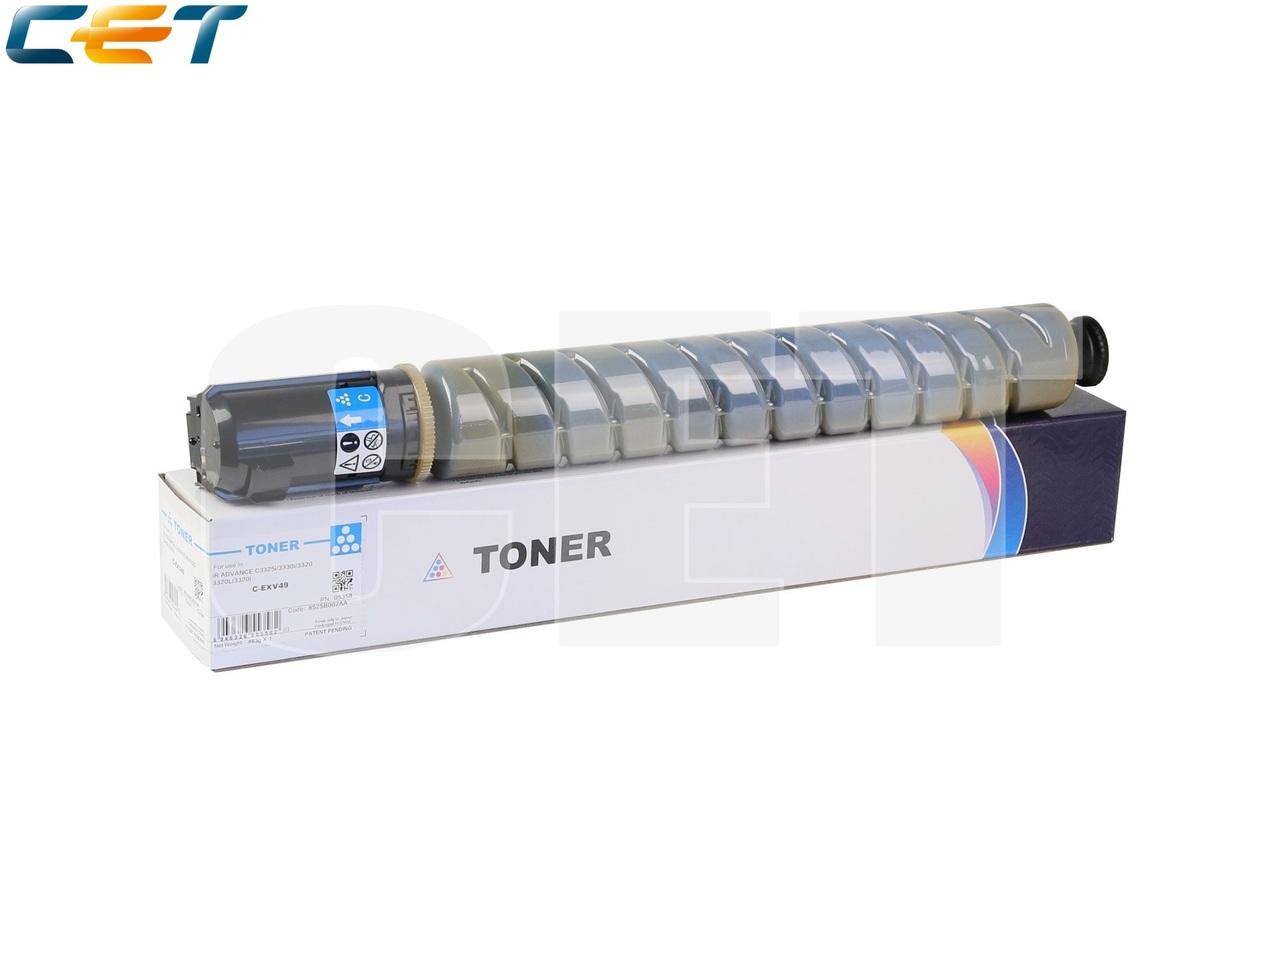 Тонер-картридж (CPP, TF8) C-EXV49 для CANON iR ADVANCEC3325i/3330i/3320 (CET) Cyan, 463г, 19000 стр., CET5358